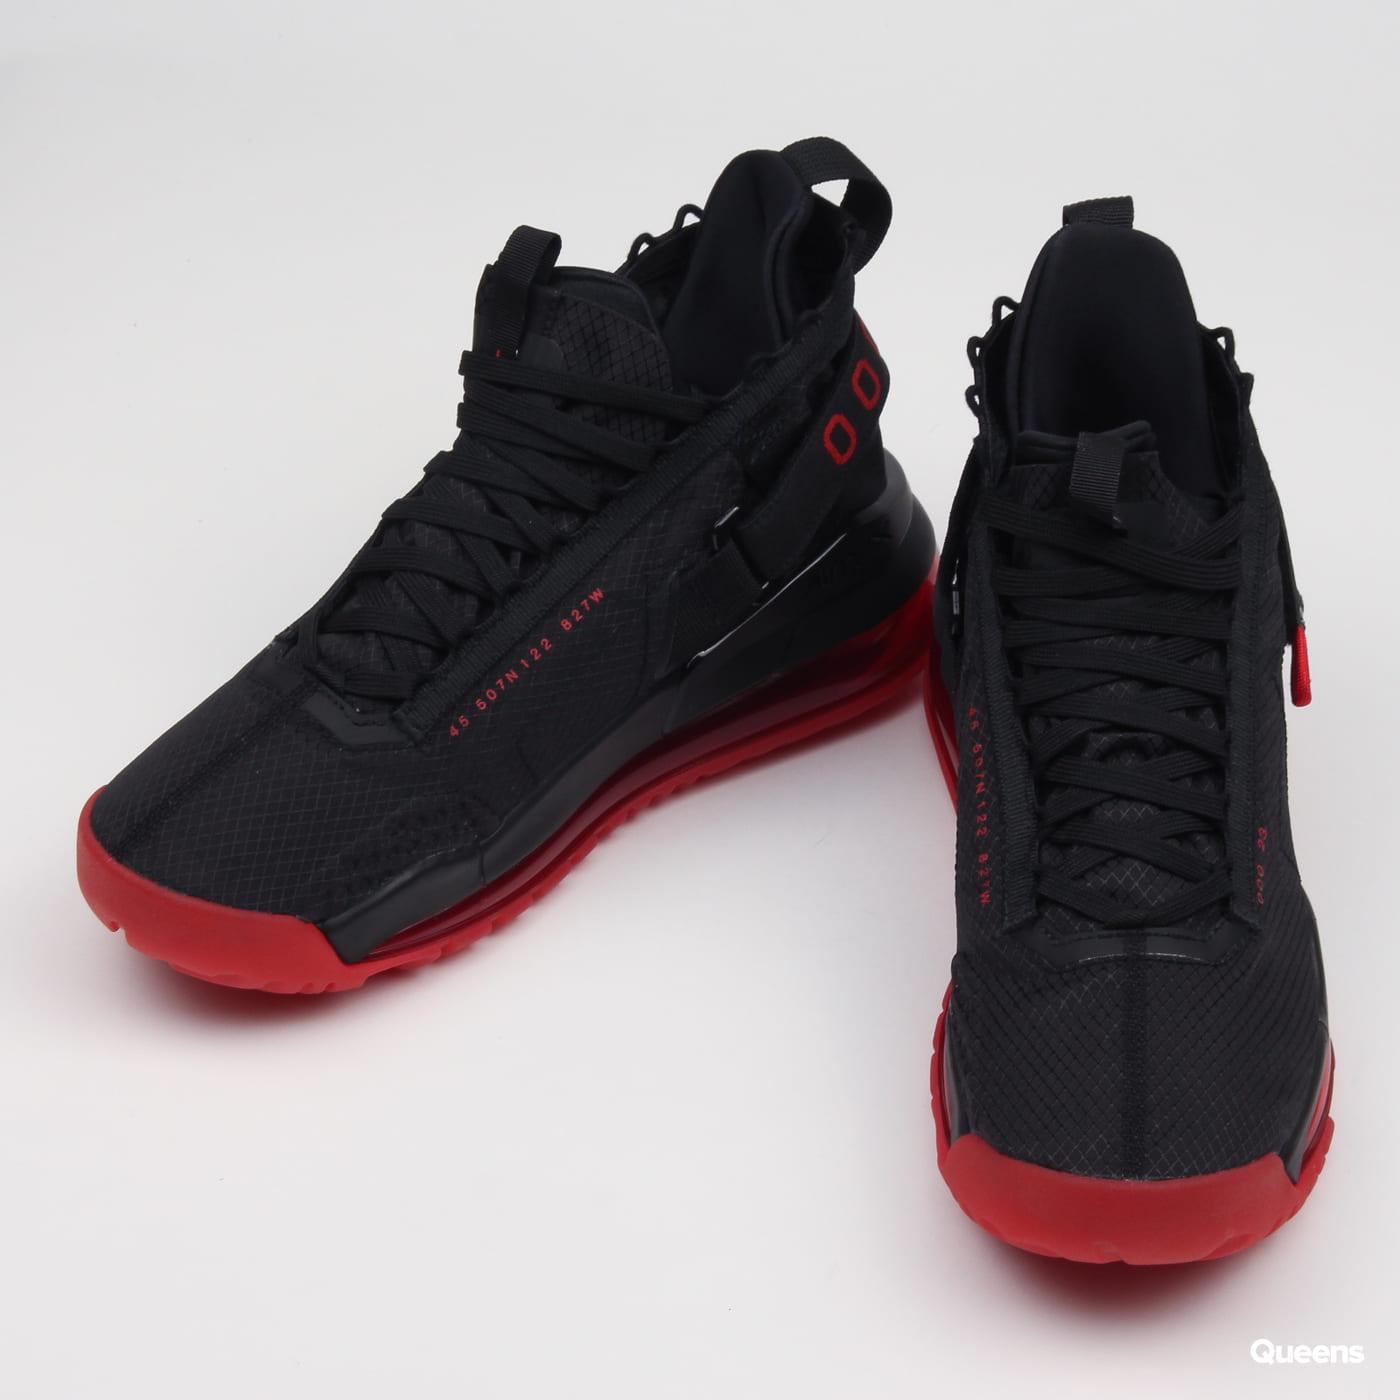 Jordan Jordan Proto-Max 720 black / university red